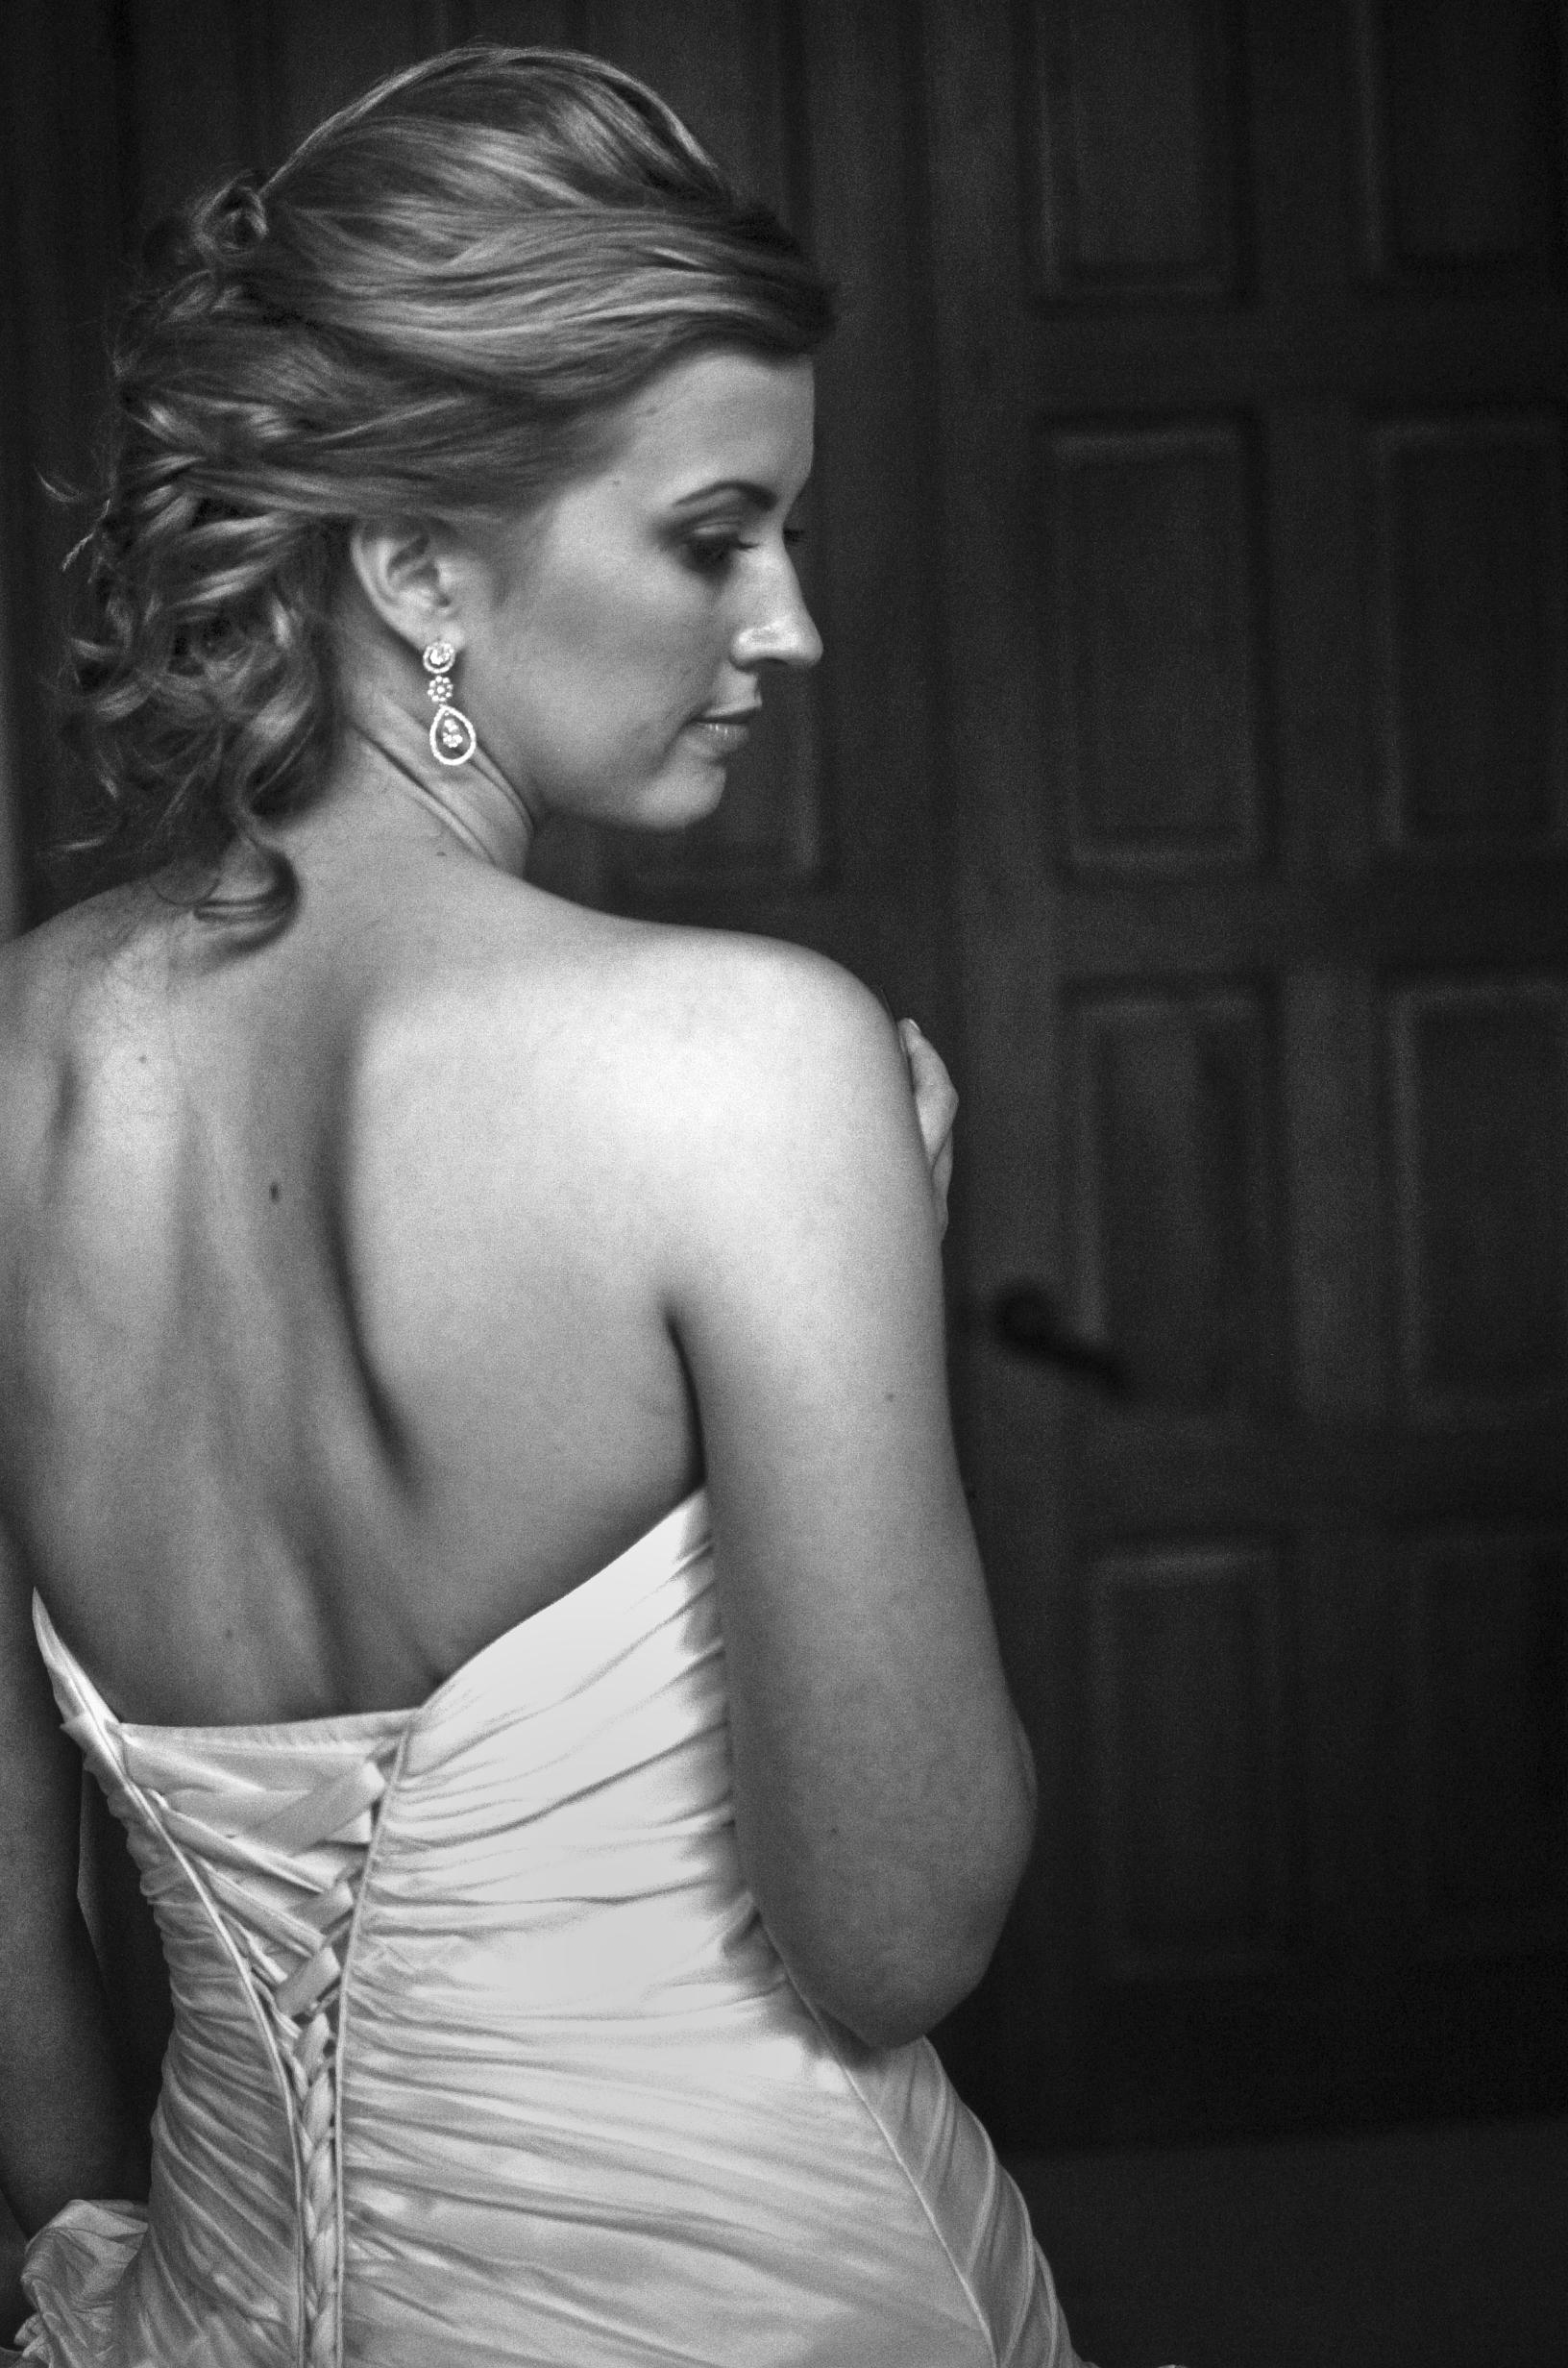 weddinglook tone.jpg